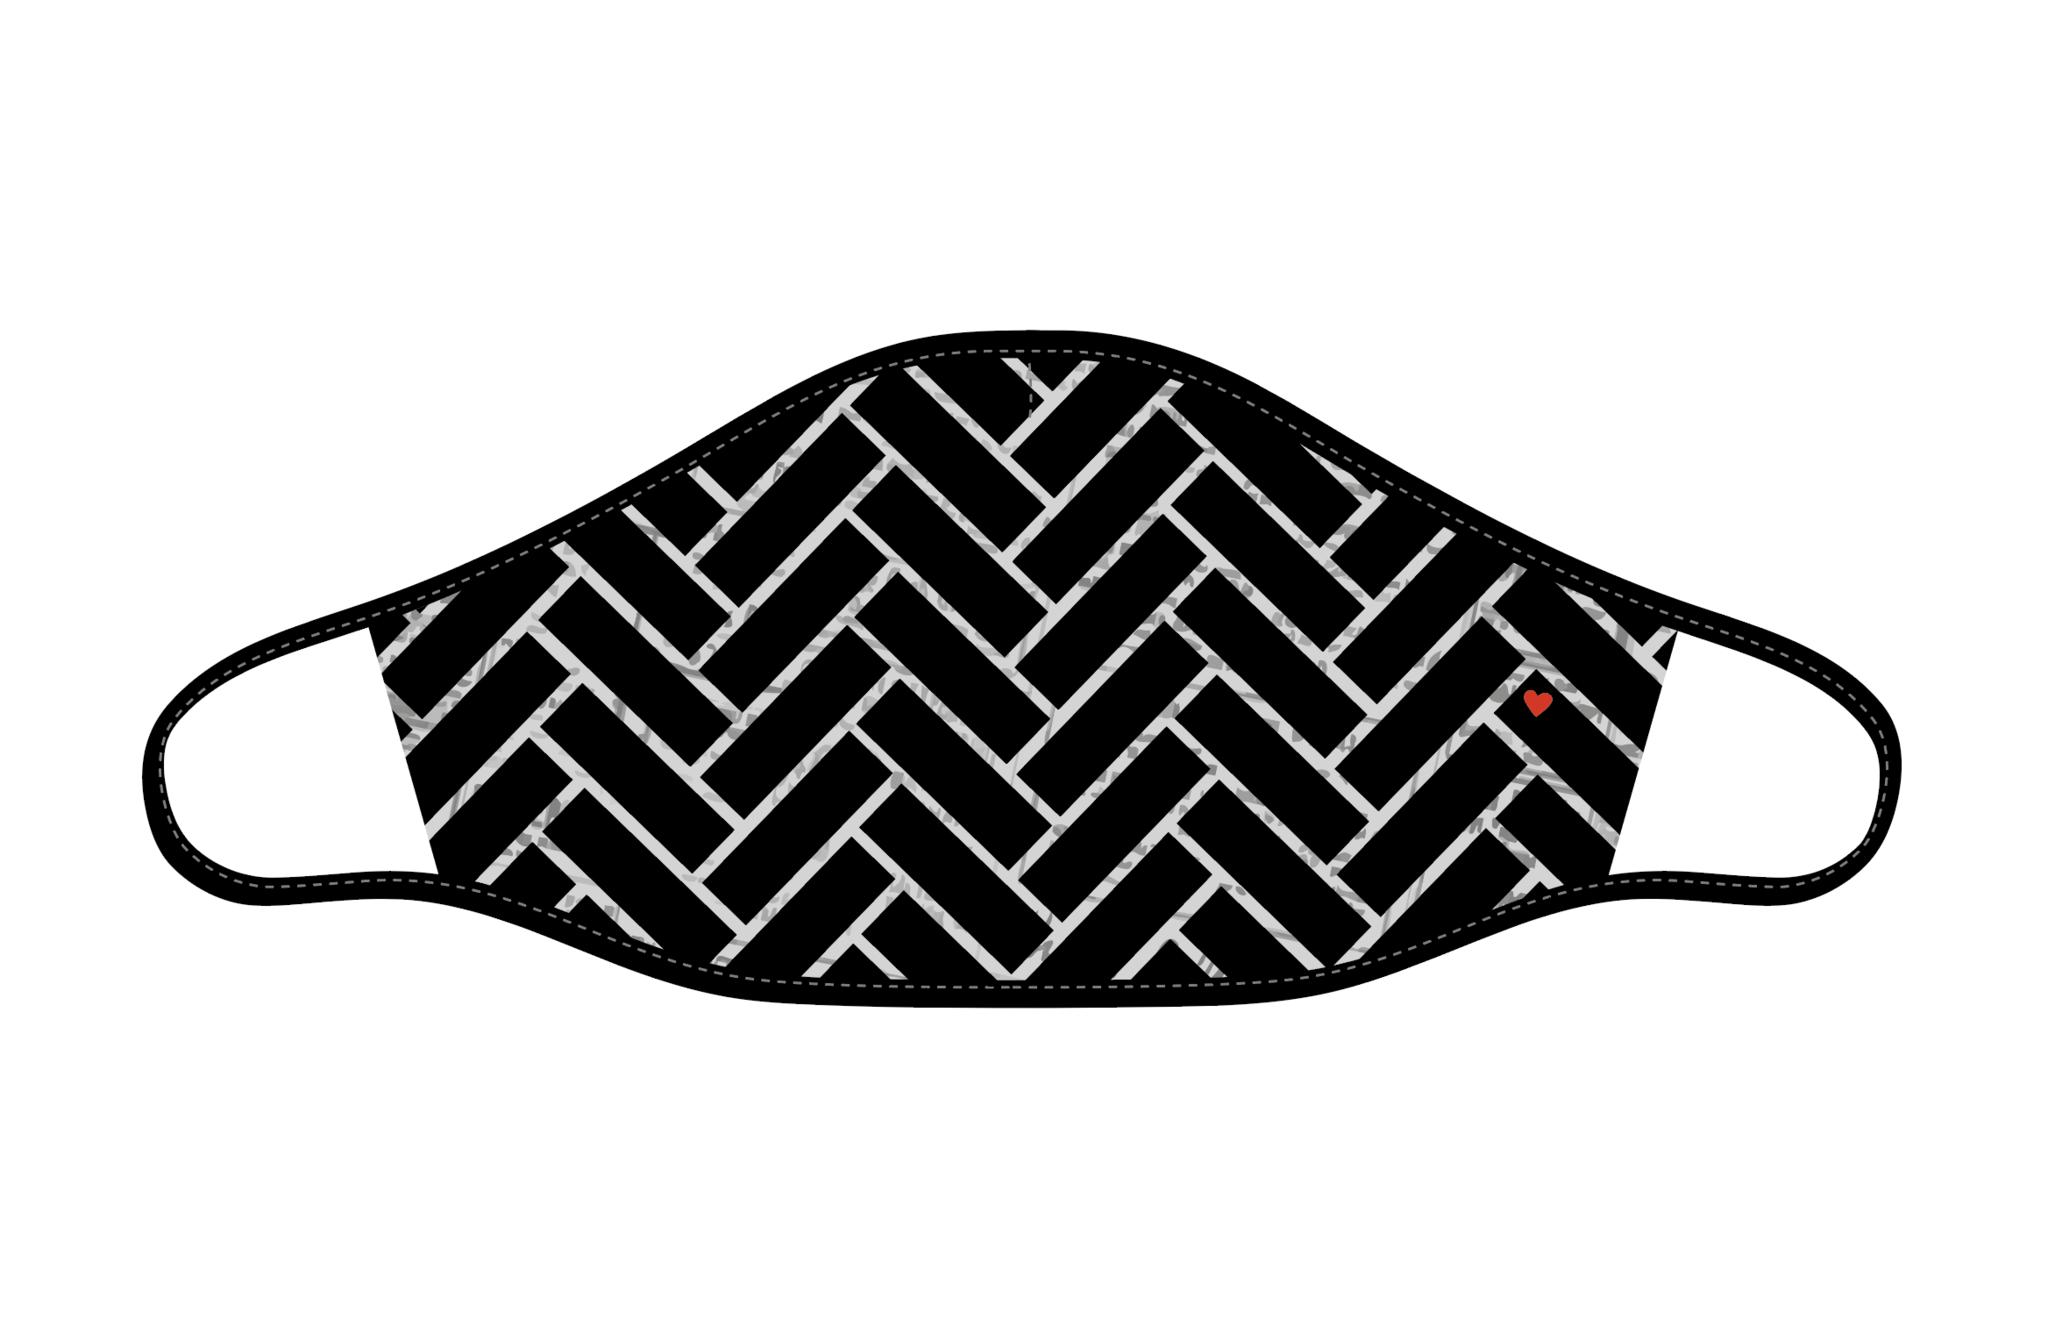 Volt Design Masque no.434-NR